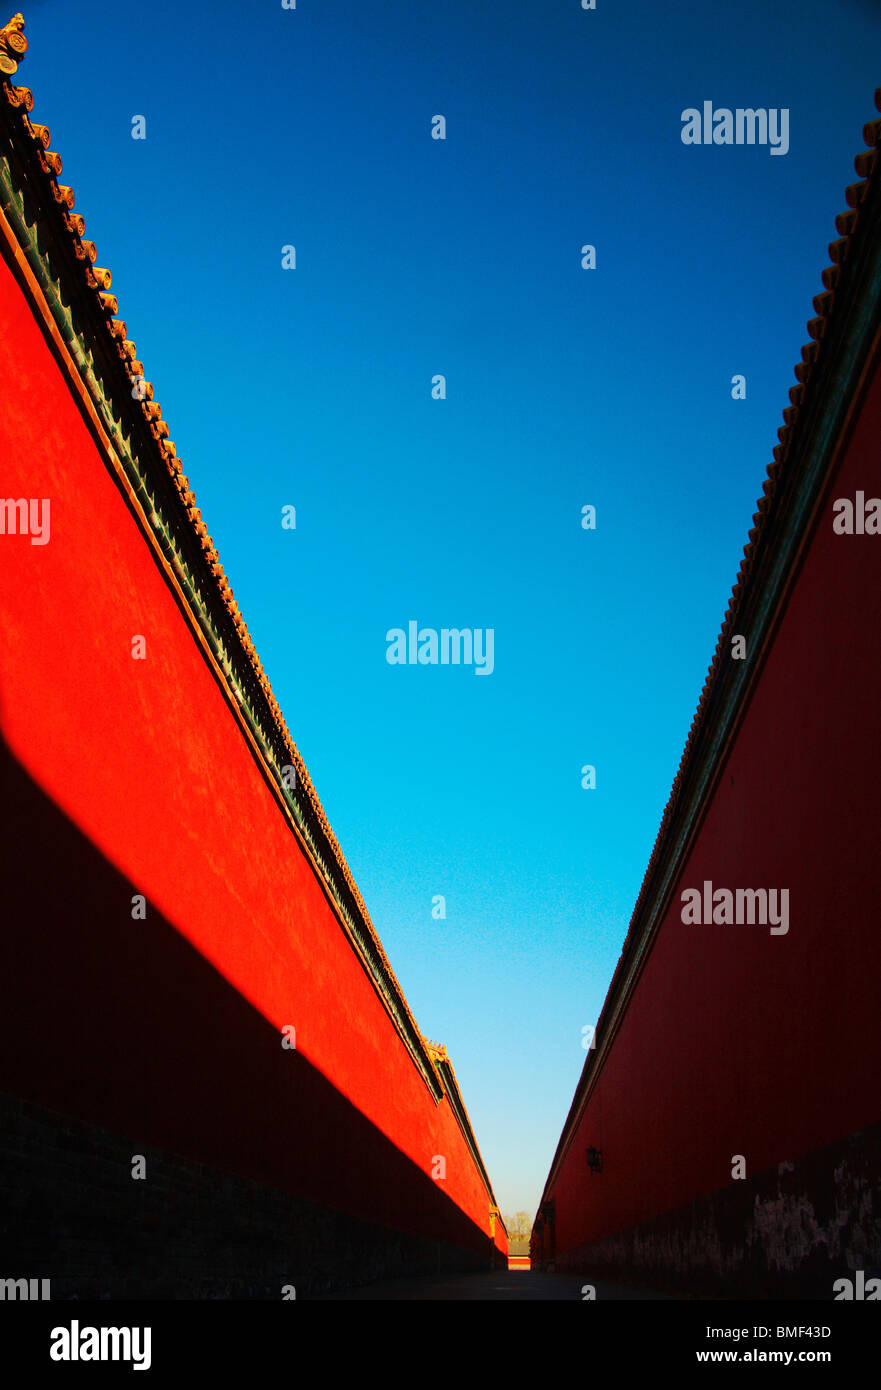 Rote Palast Mauer der verbotenen Stadt, Peking, China Stockbild